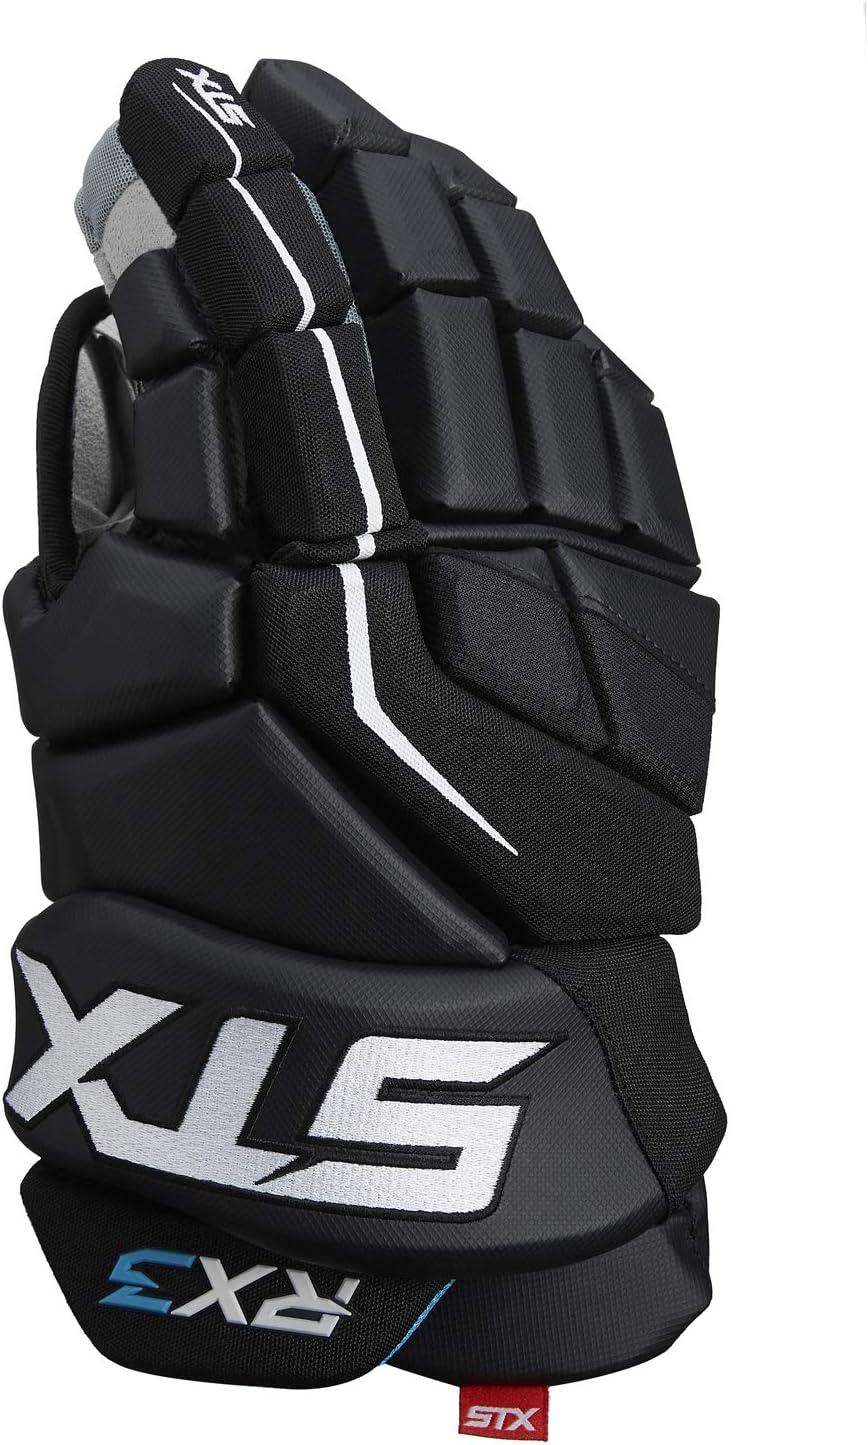 STX HG RX30 13 BK//BK Ice Hockey Surgeon RX3 Glove 13 Black 13